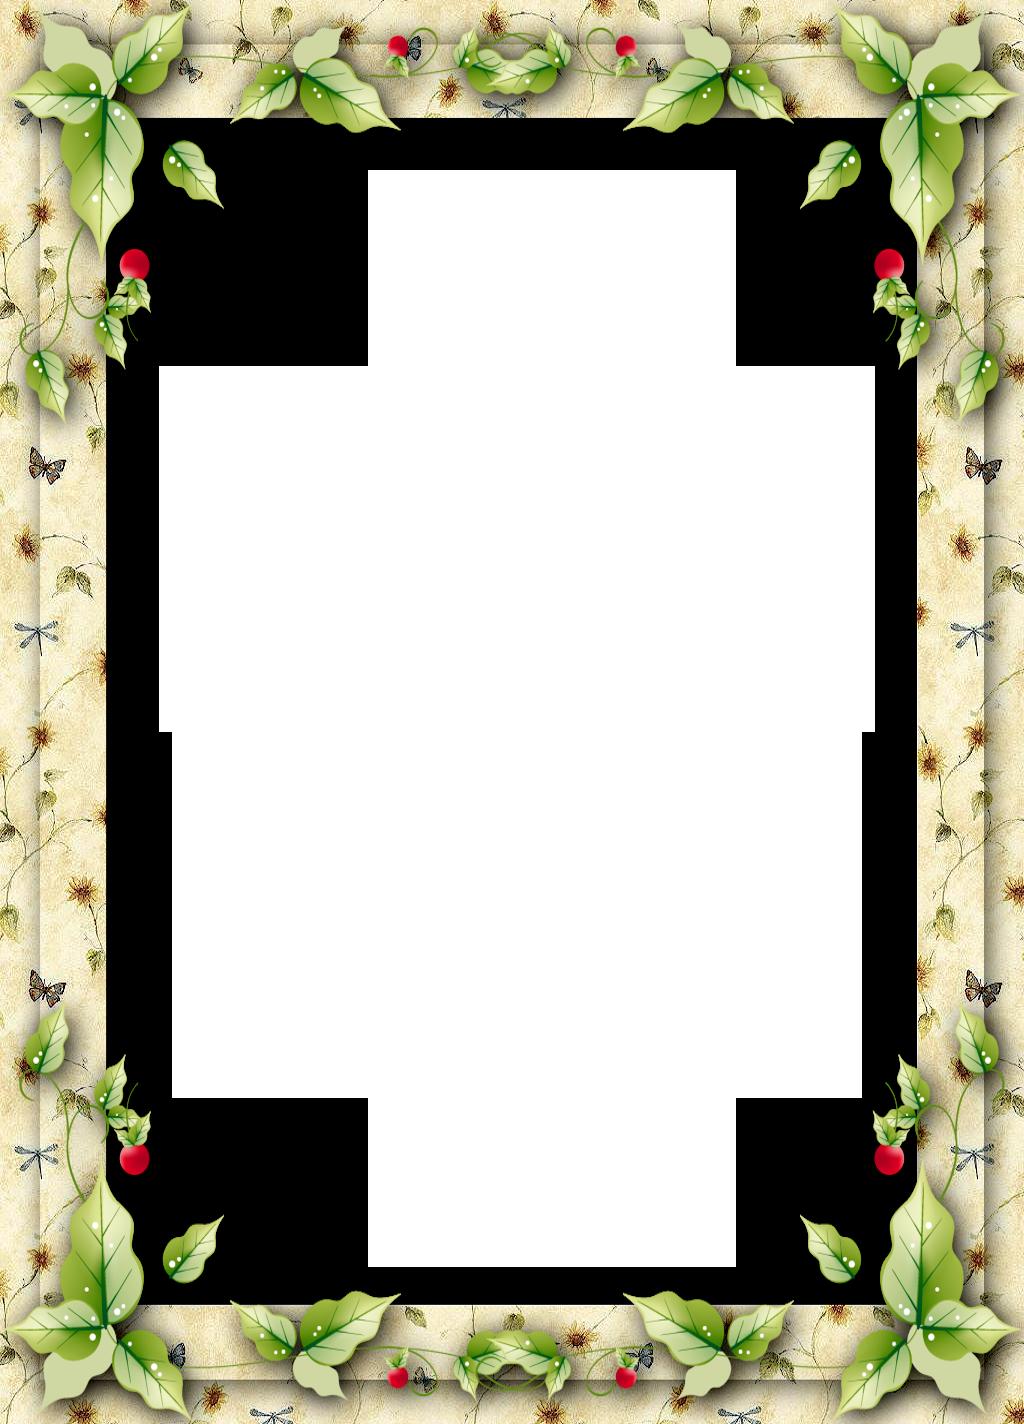 Frame clipart xmas. Christmas with mistletoe leaves